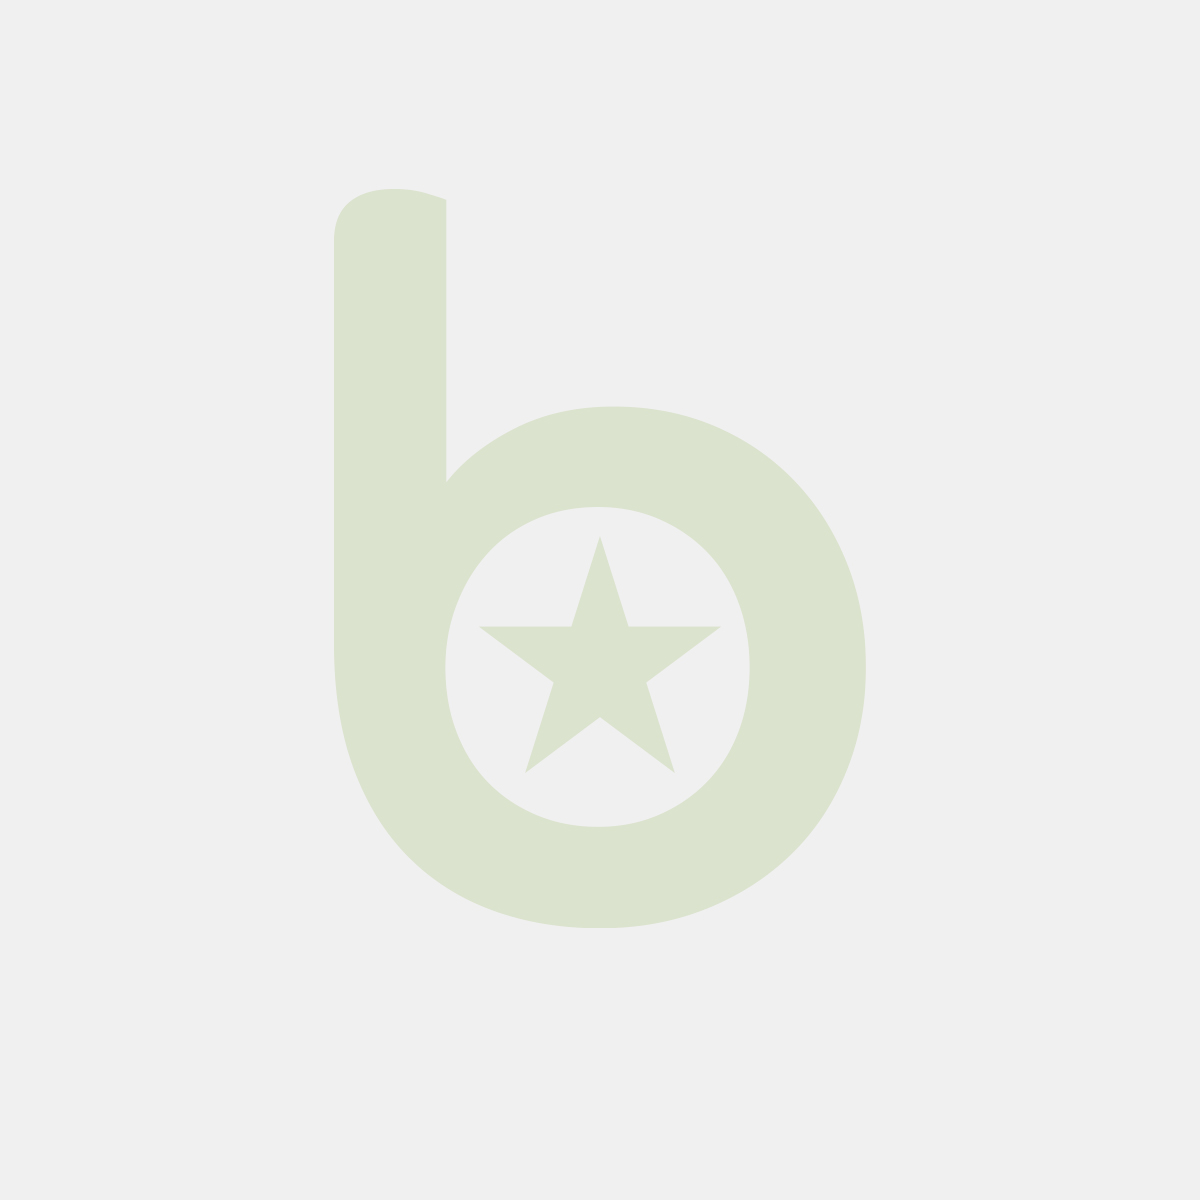 FINGERFOOD - pucharek PS czarny 70ml op. 25 sztuk